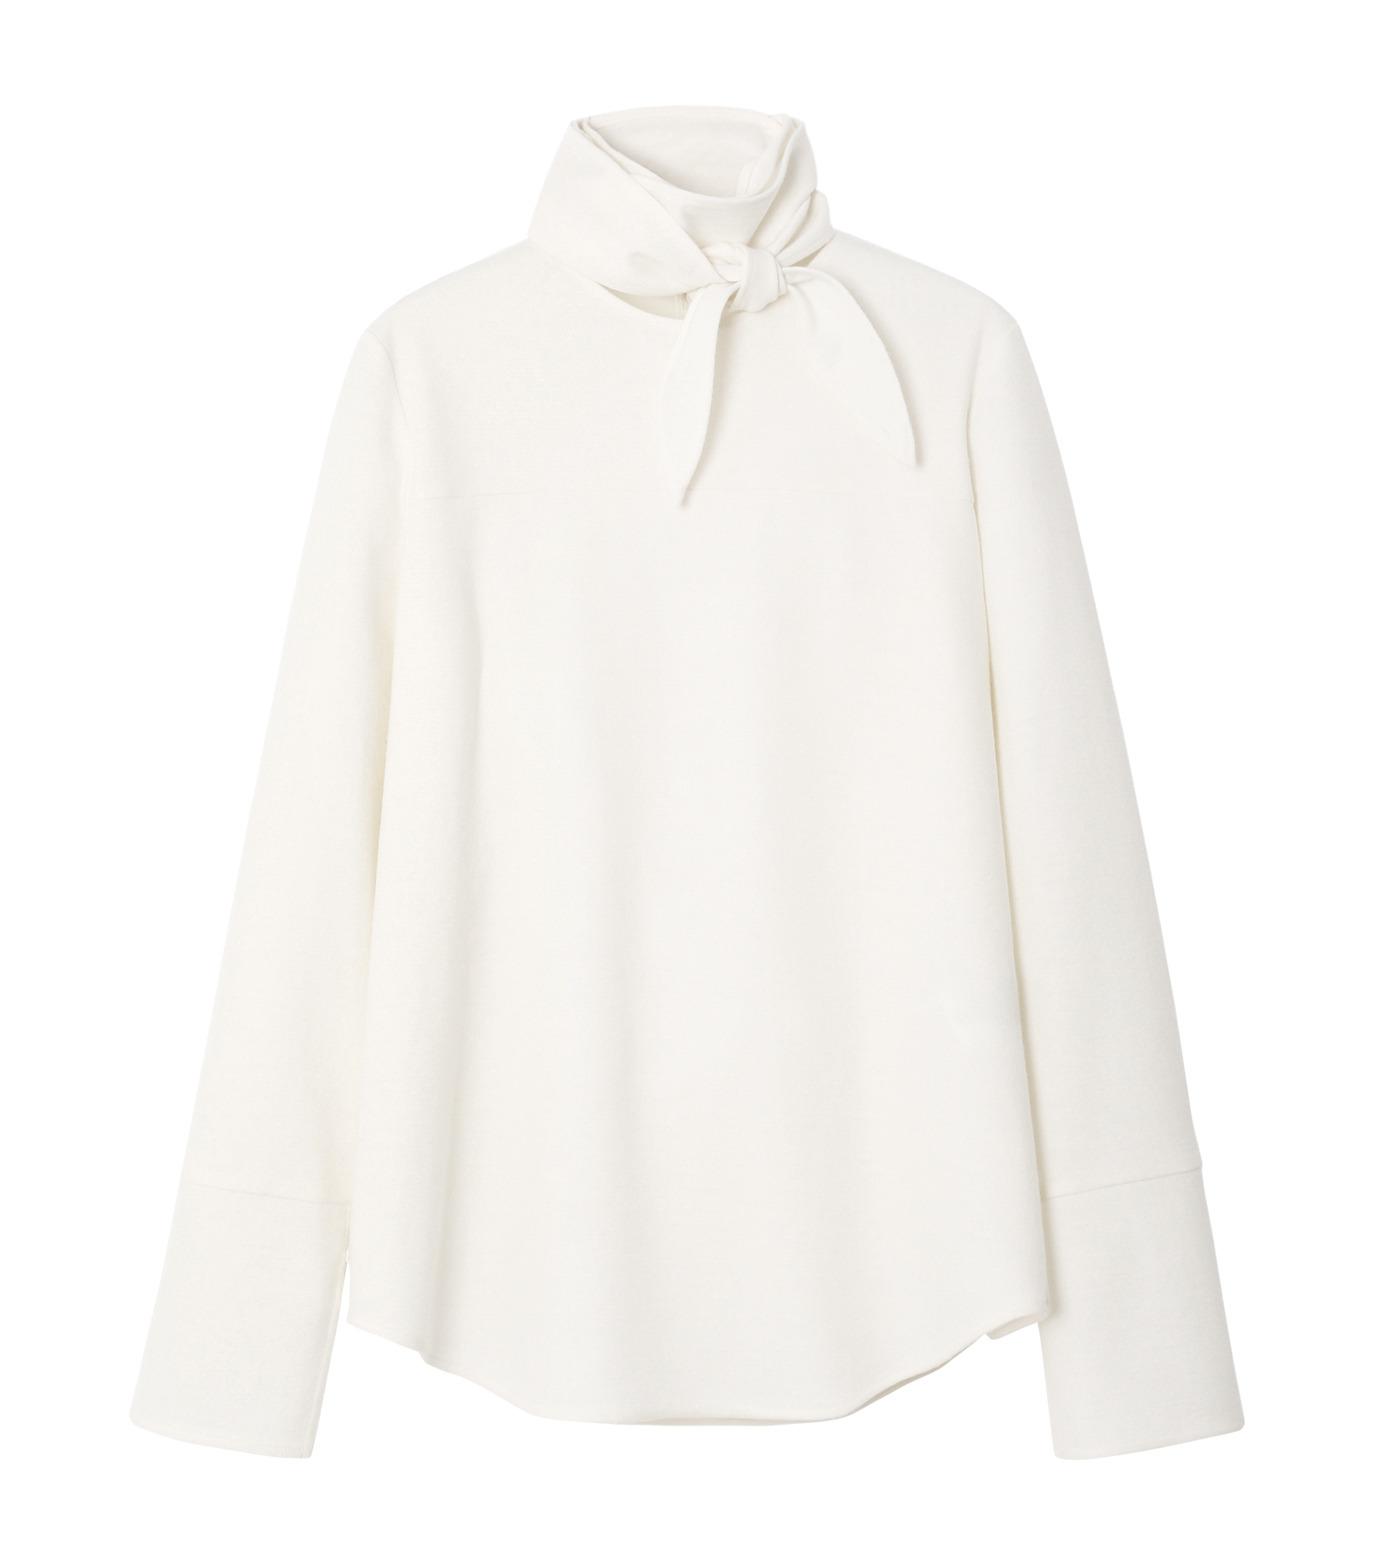 LE CIEL BLEU(ルシェルブルー)のショートボウブラウス-WHITE(シャツ/shirt)-18A63622 拡大詳細画像4